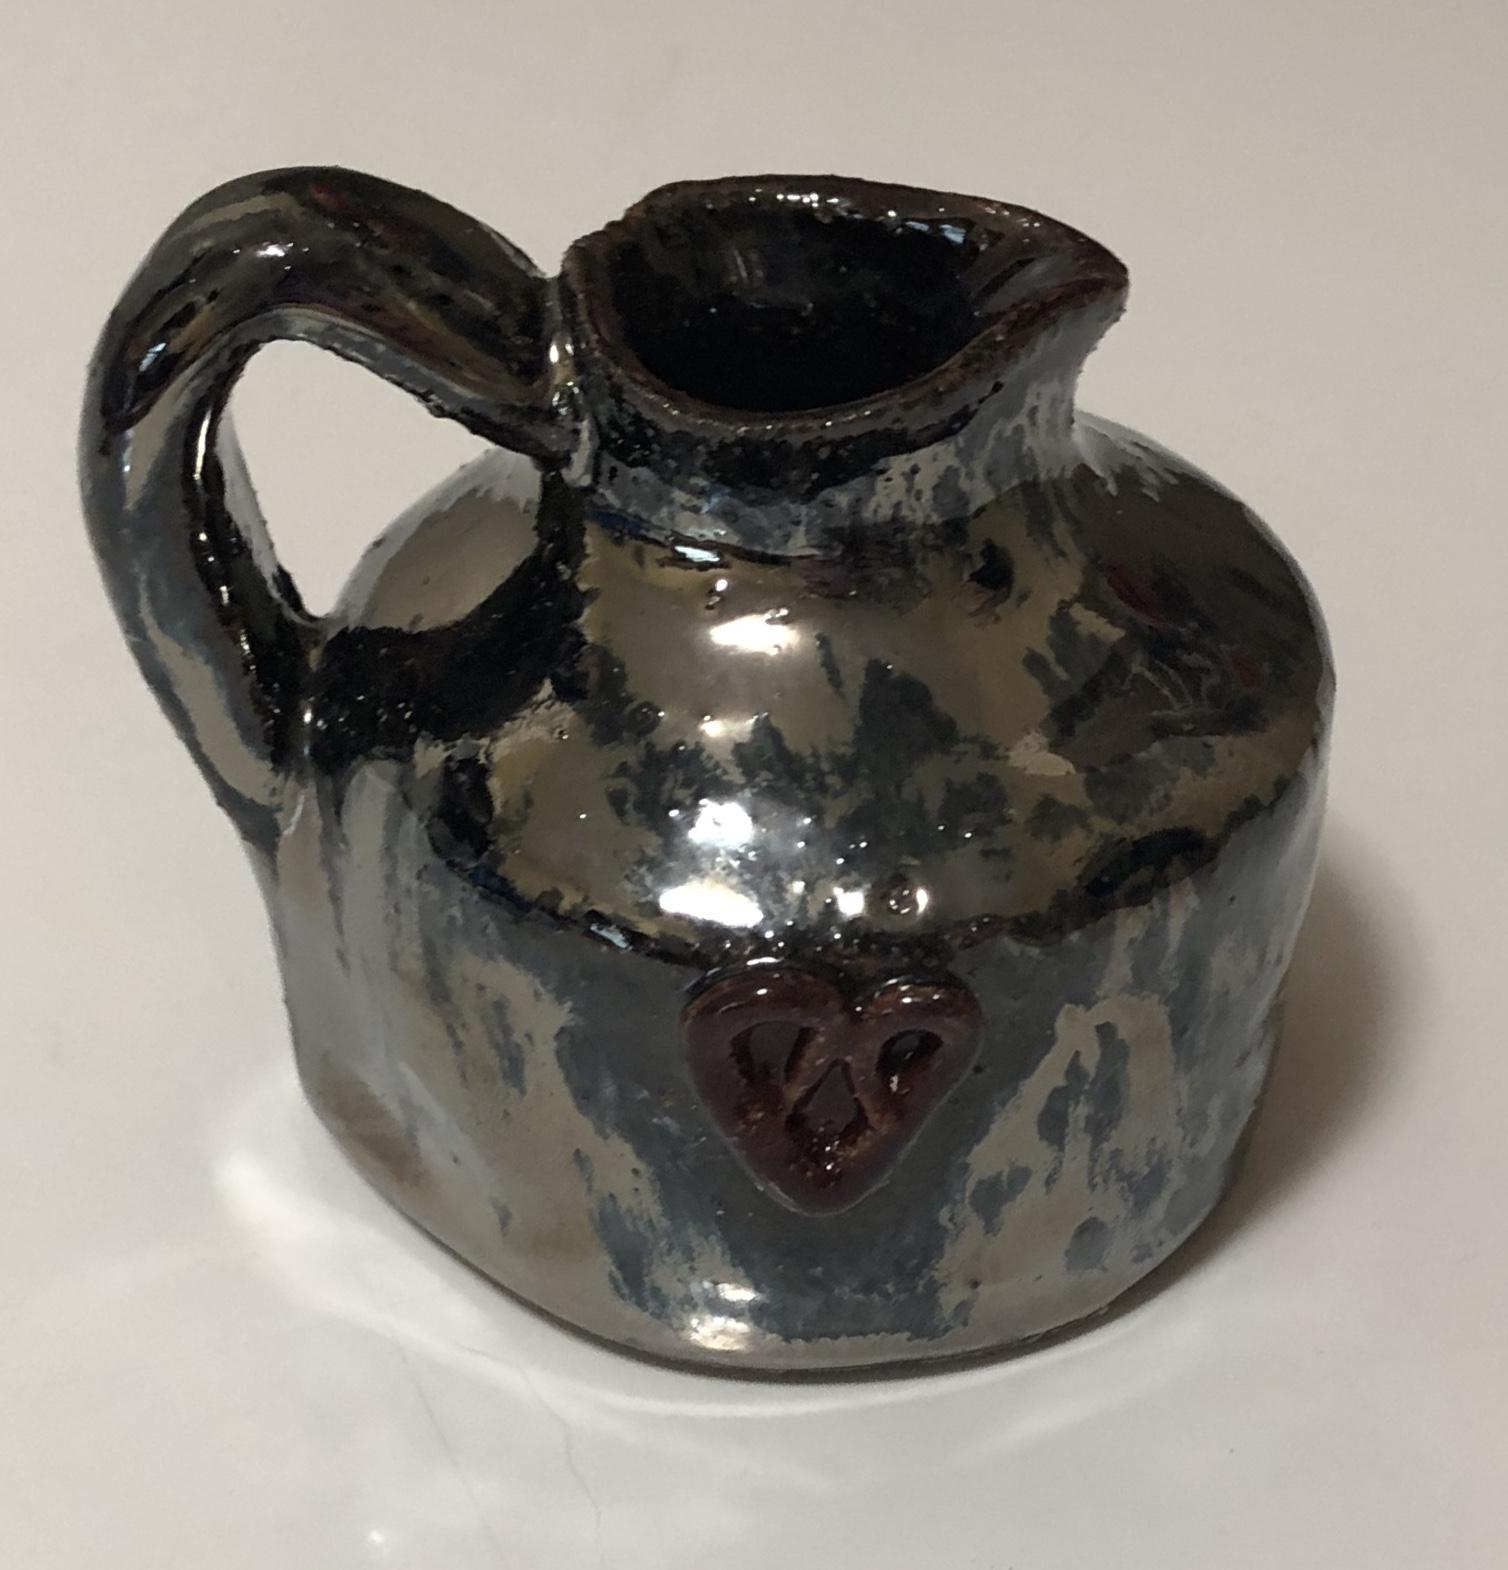 Tiny metallic pitcher